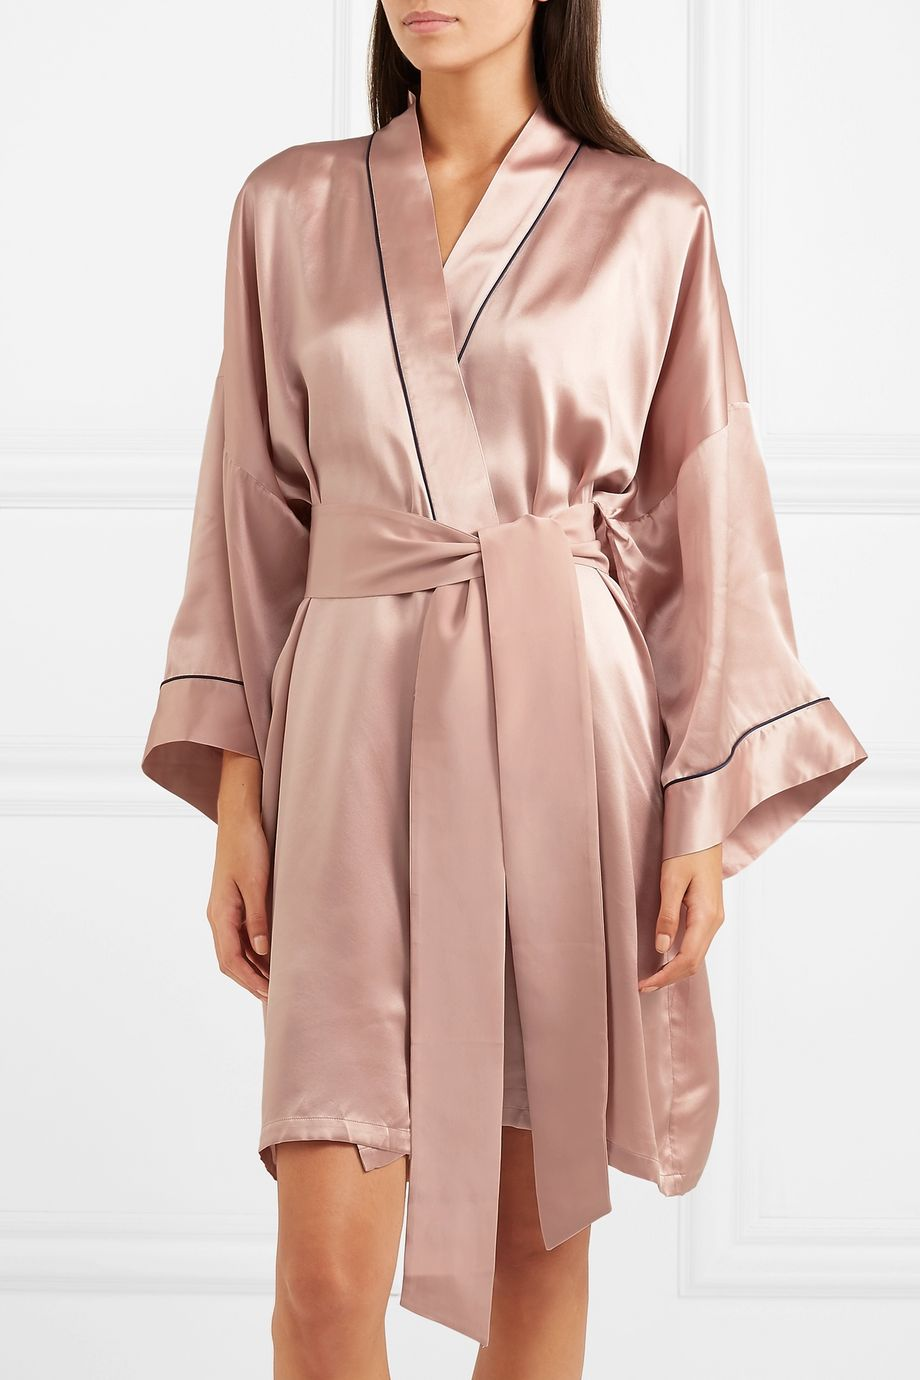 Olivia von Halle Mimi silk-satin robe